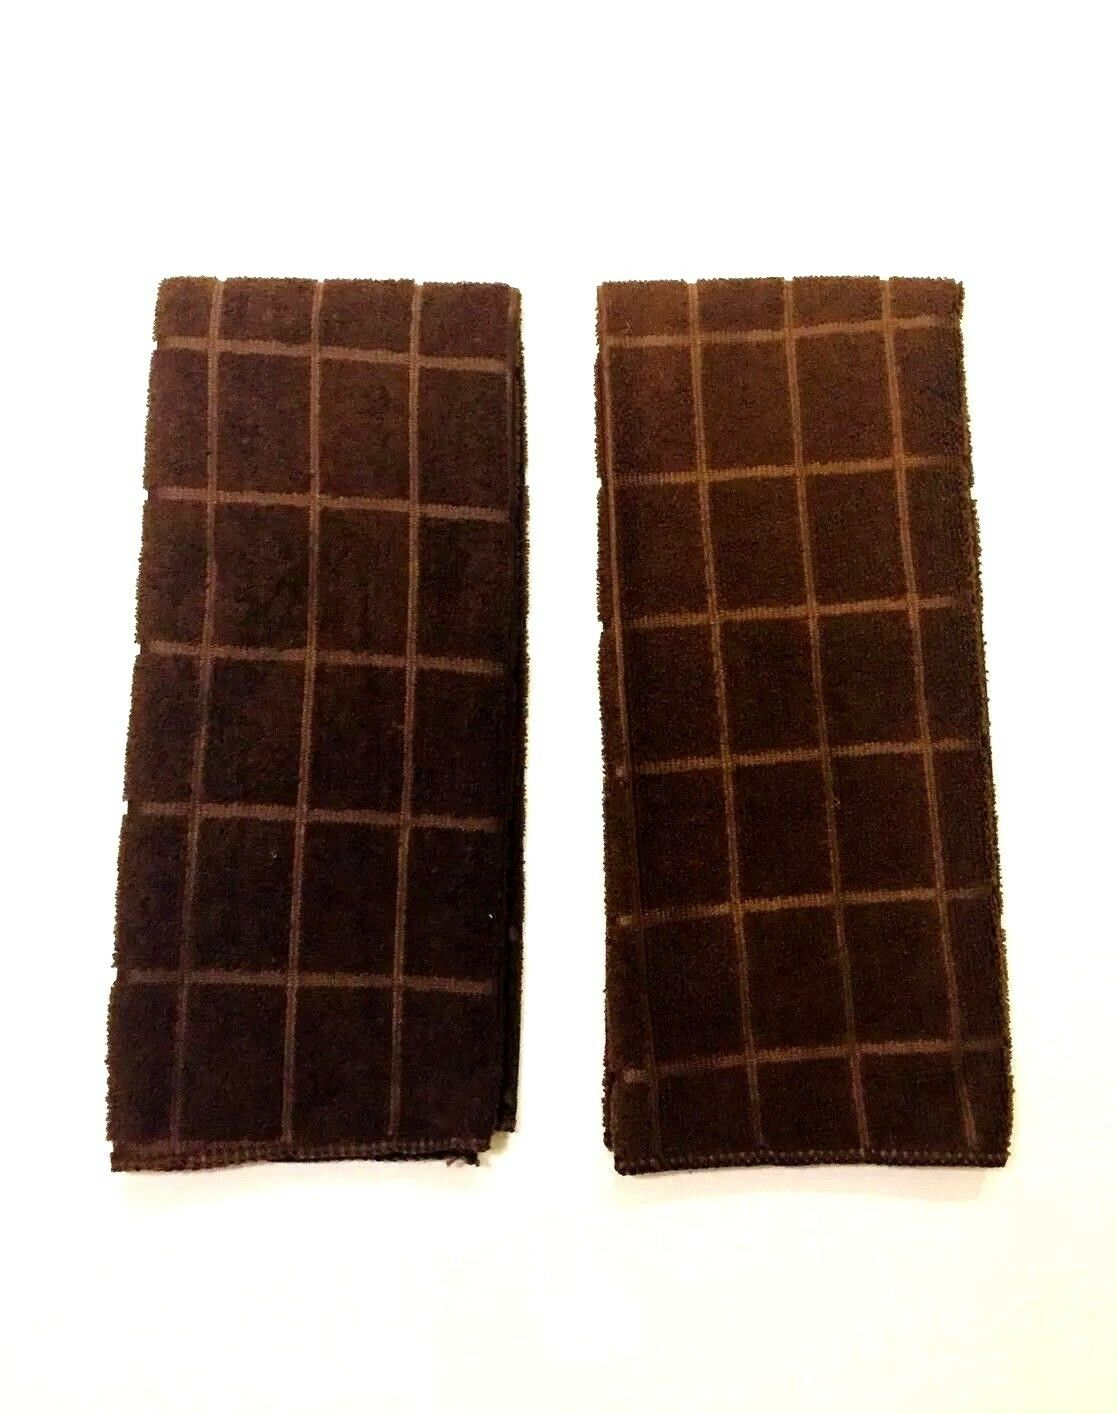 Kitchen Dish Hand Towels Solid Dark Brown Set of 2 New 15 x